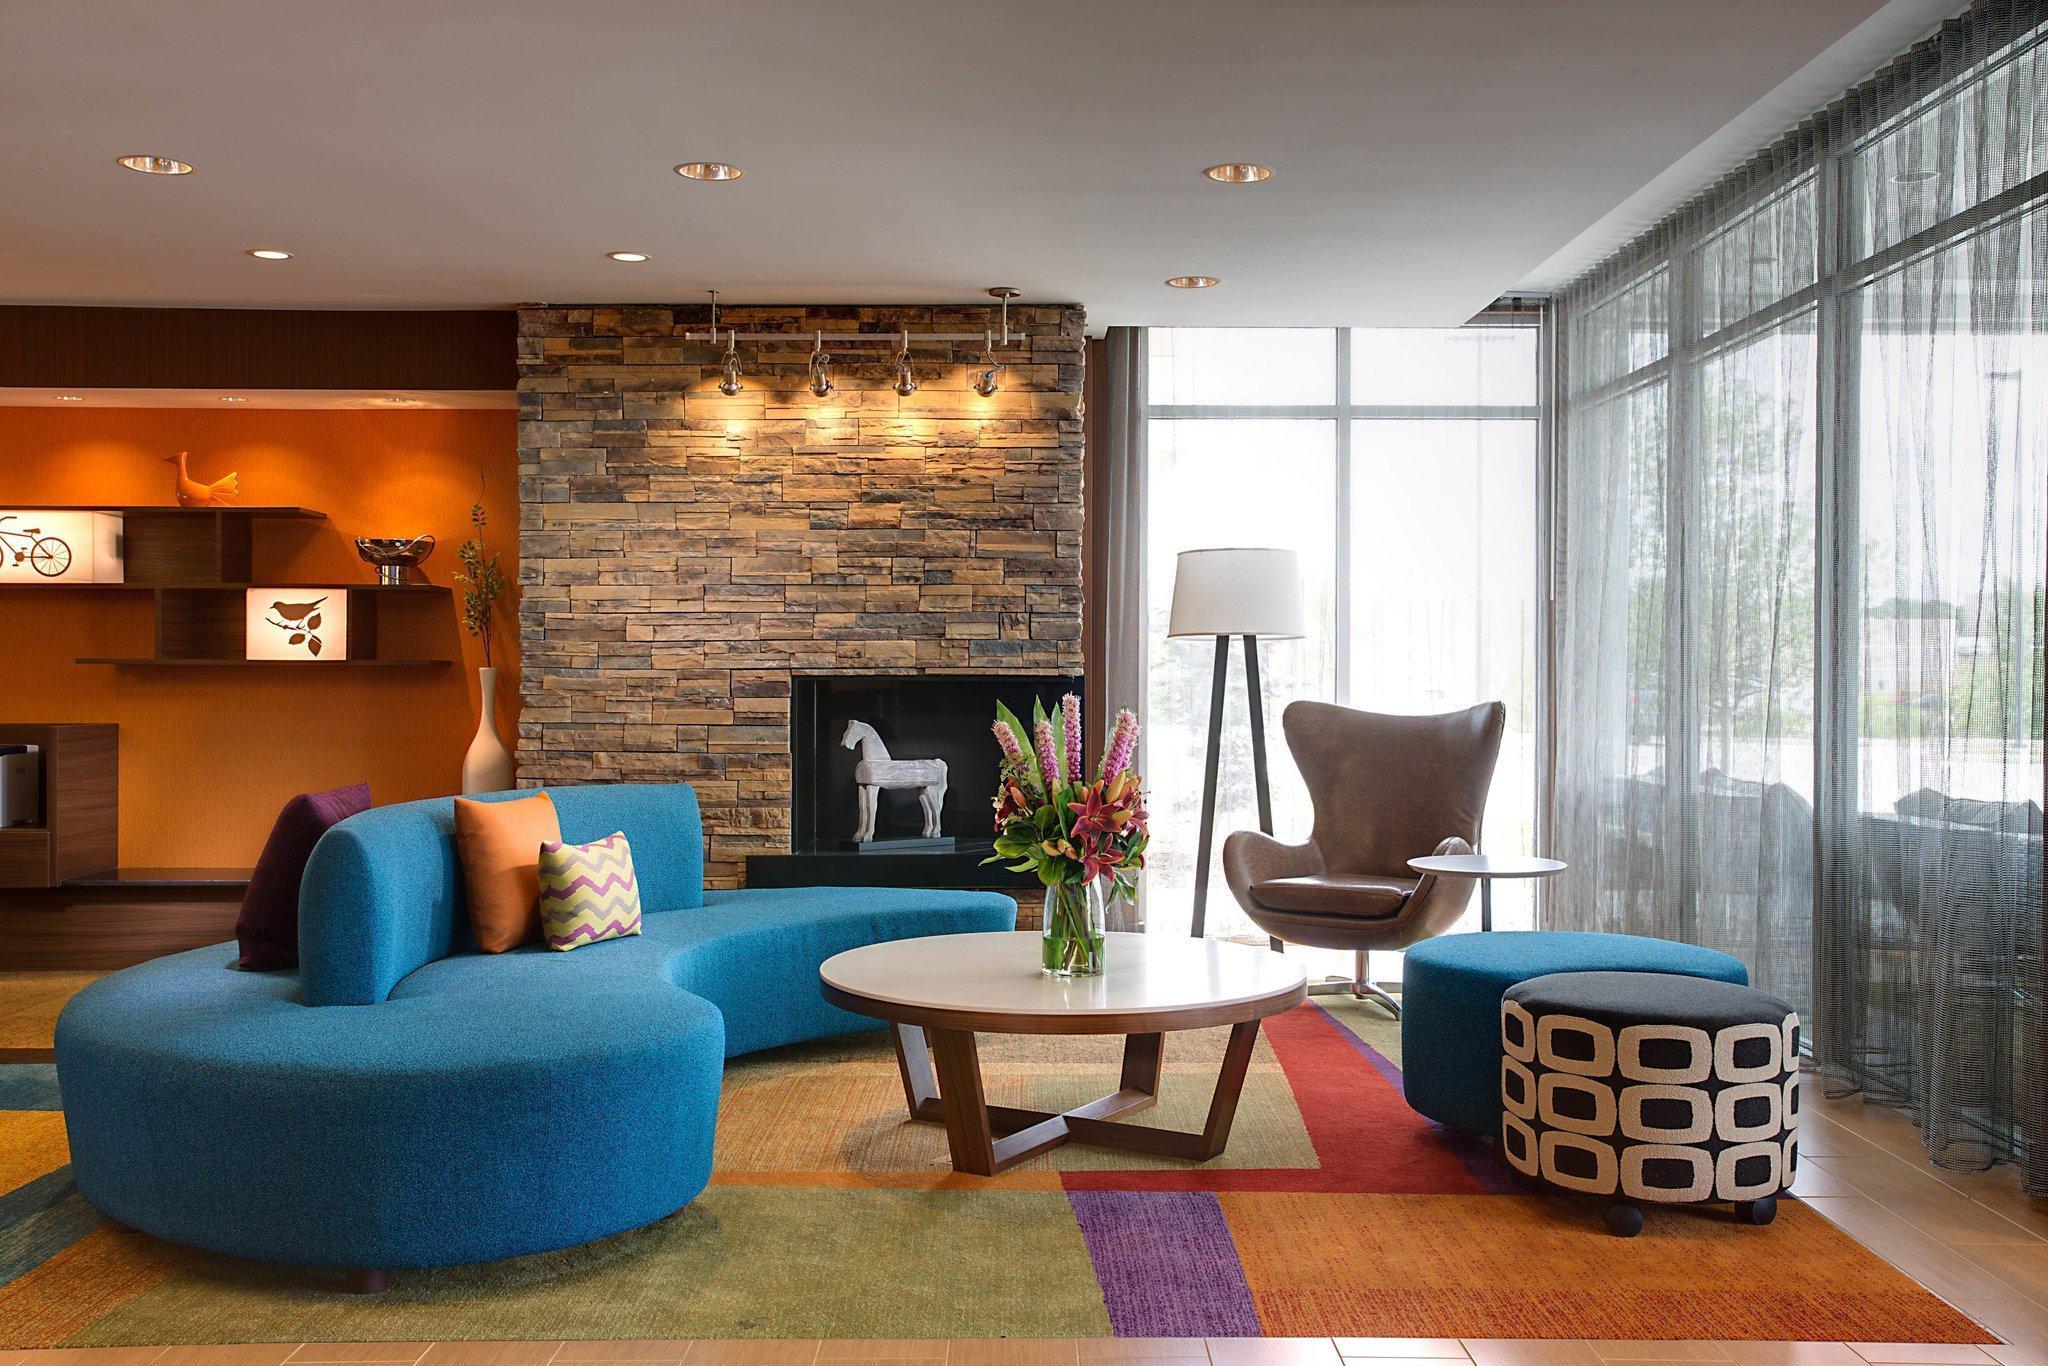 Fairfield Inn & Suites Dallas West I 30